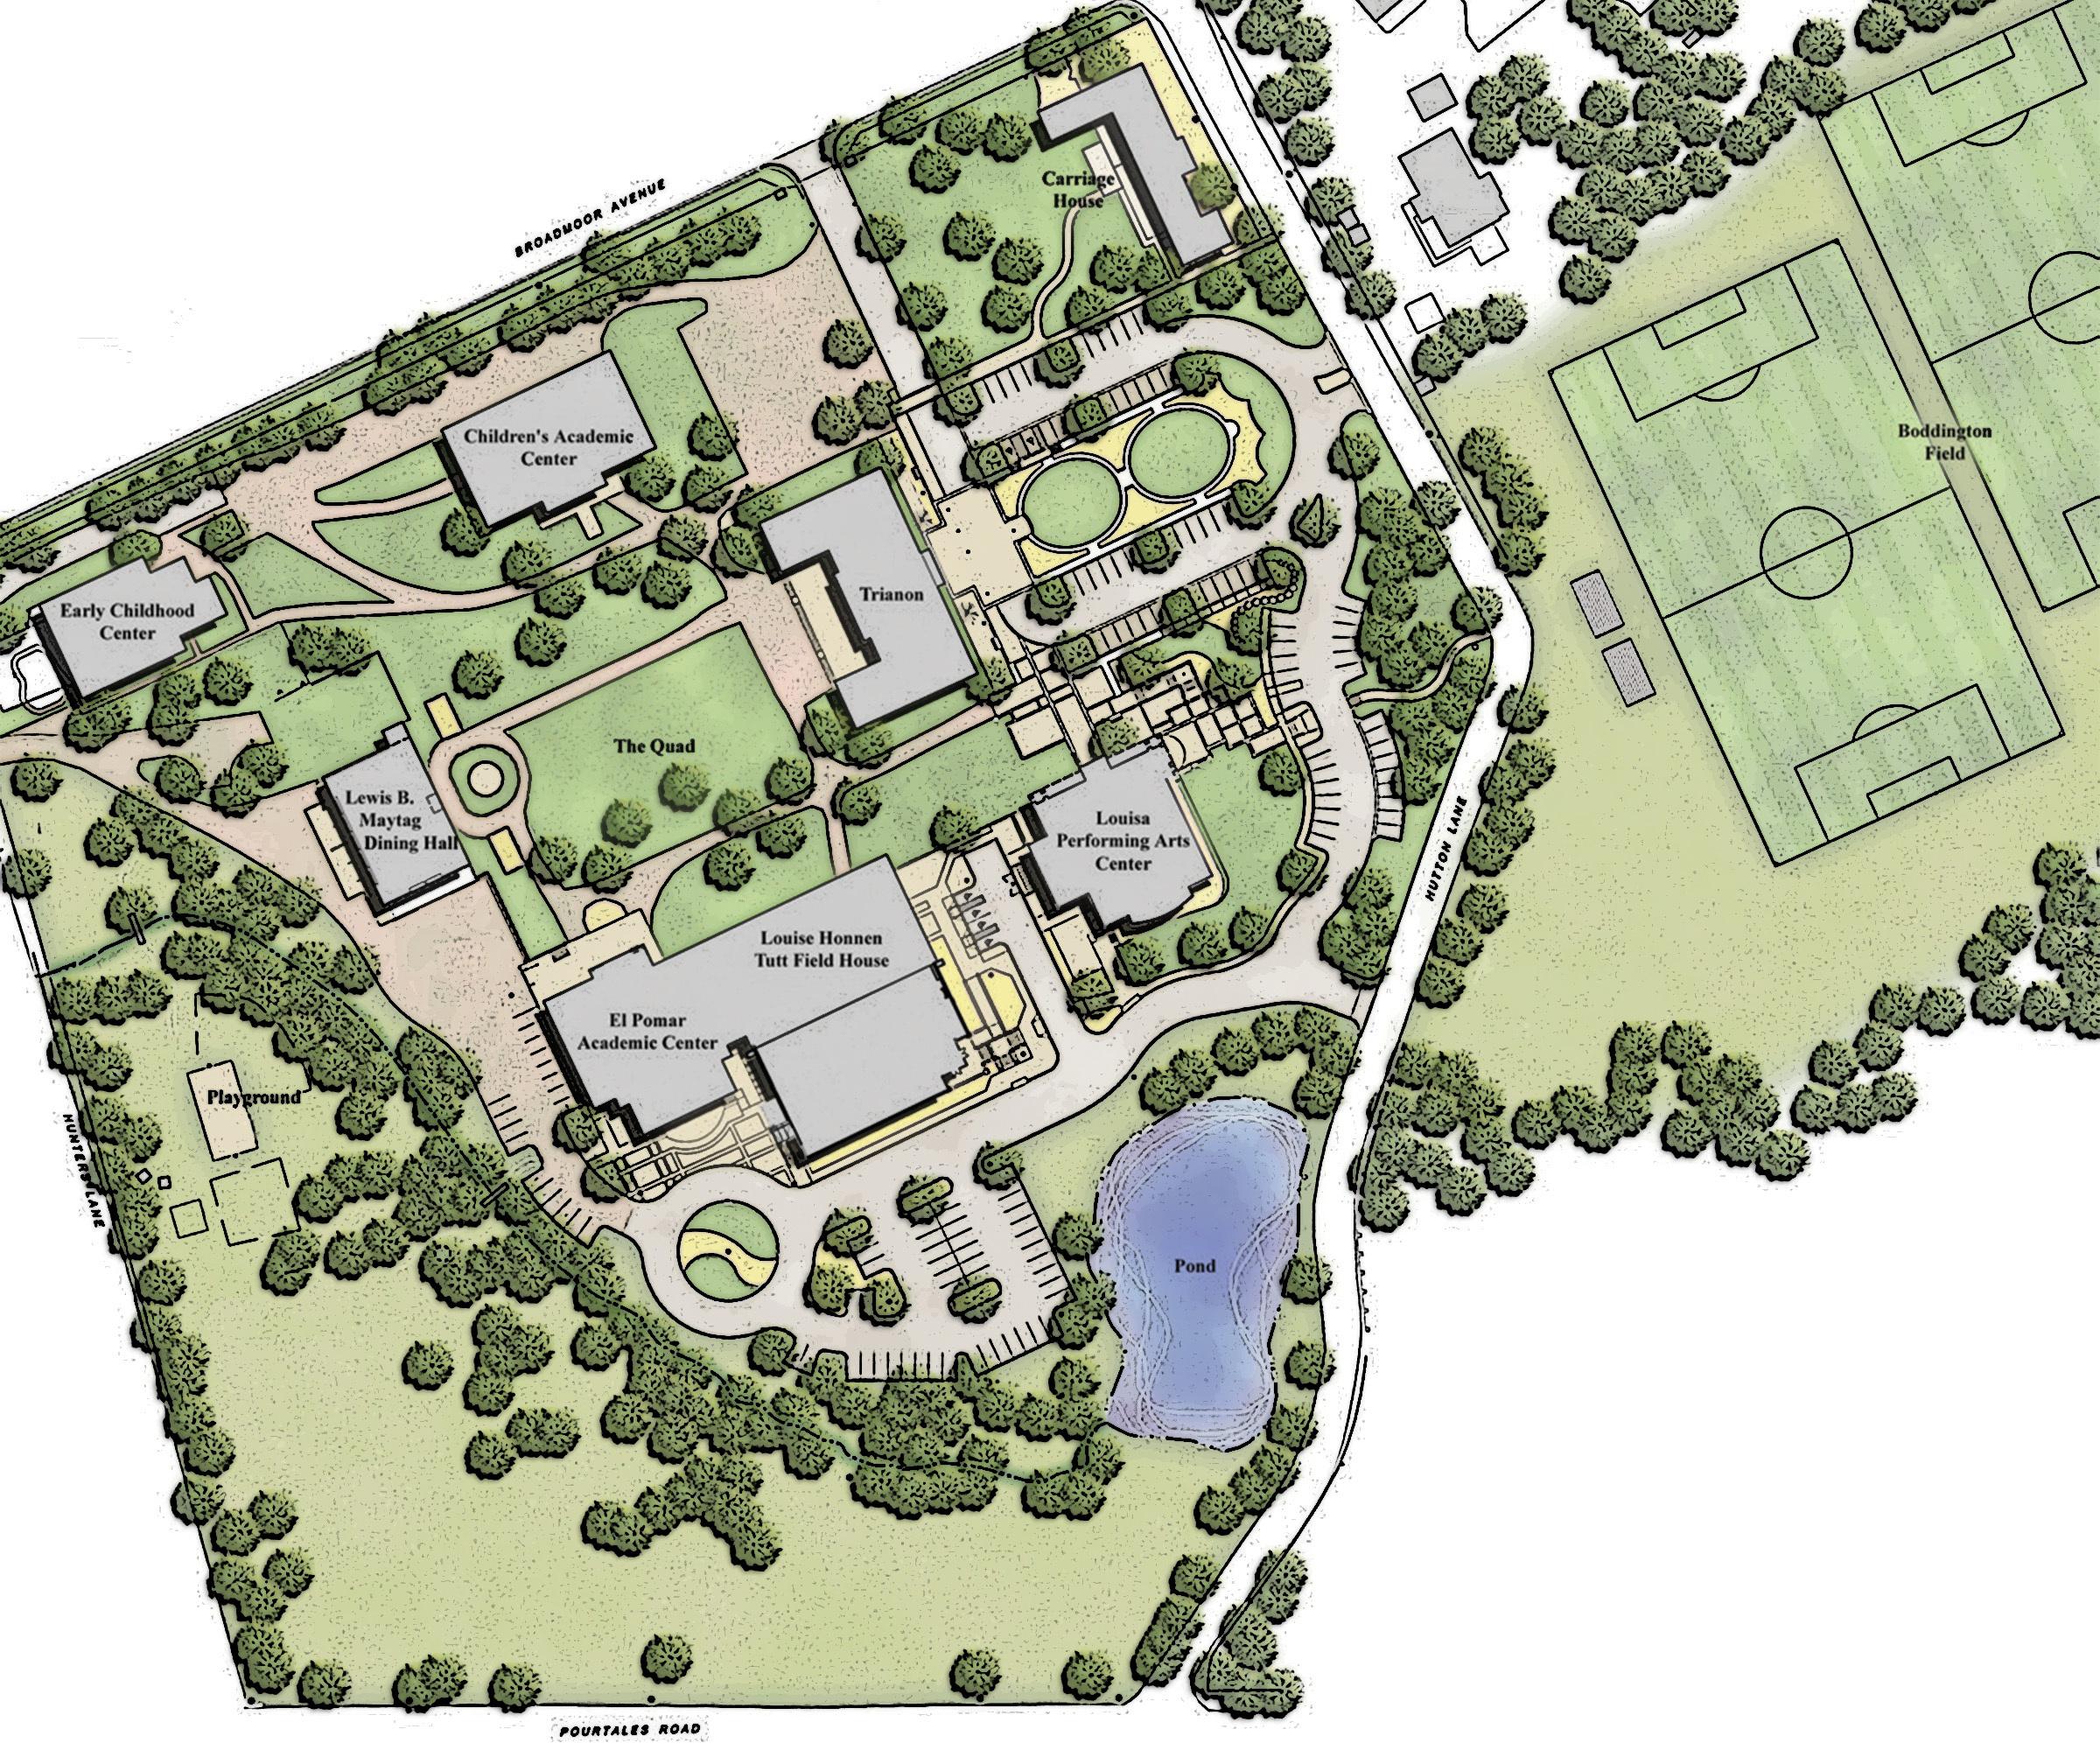 CSS Campus Map